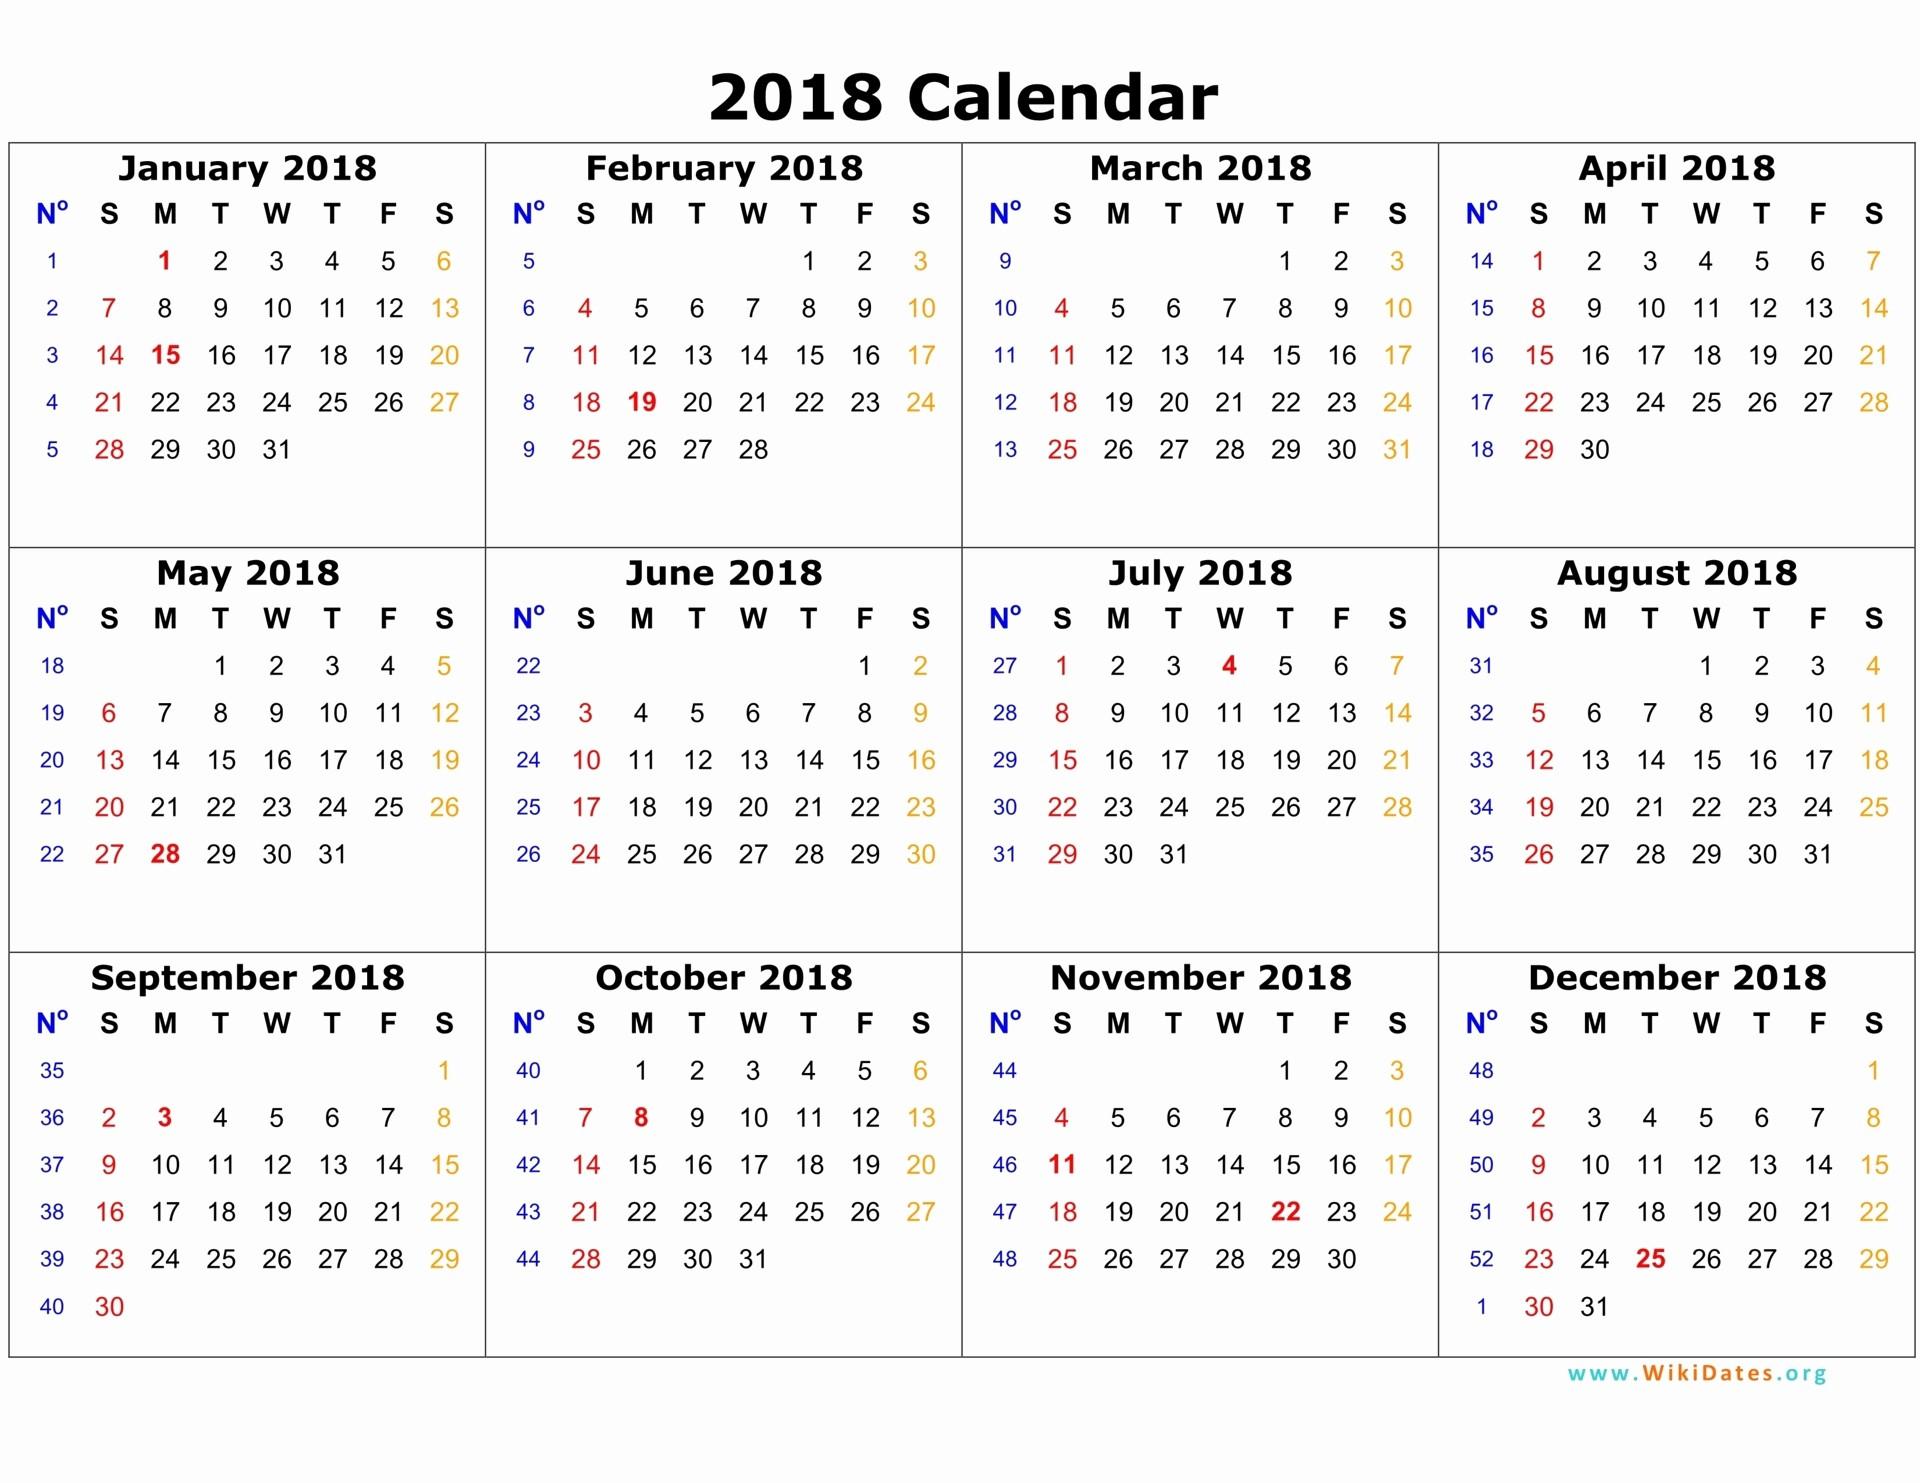 Free Printable 2018 Calendar Templates Inspirational 2018 Calendar